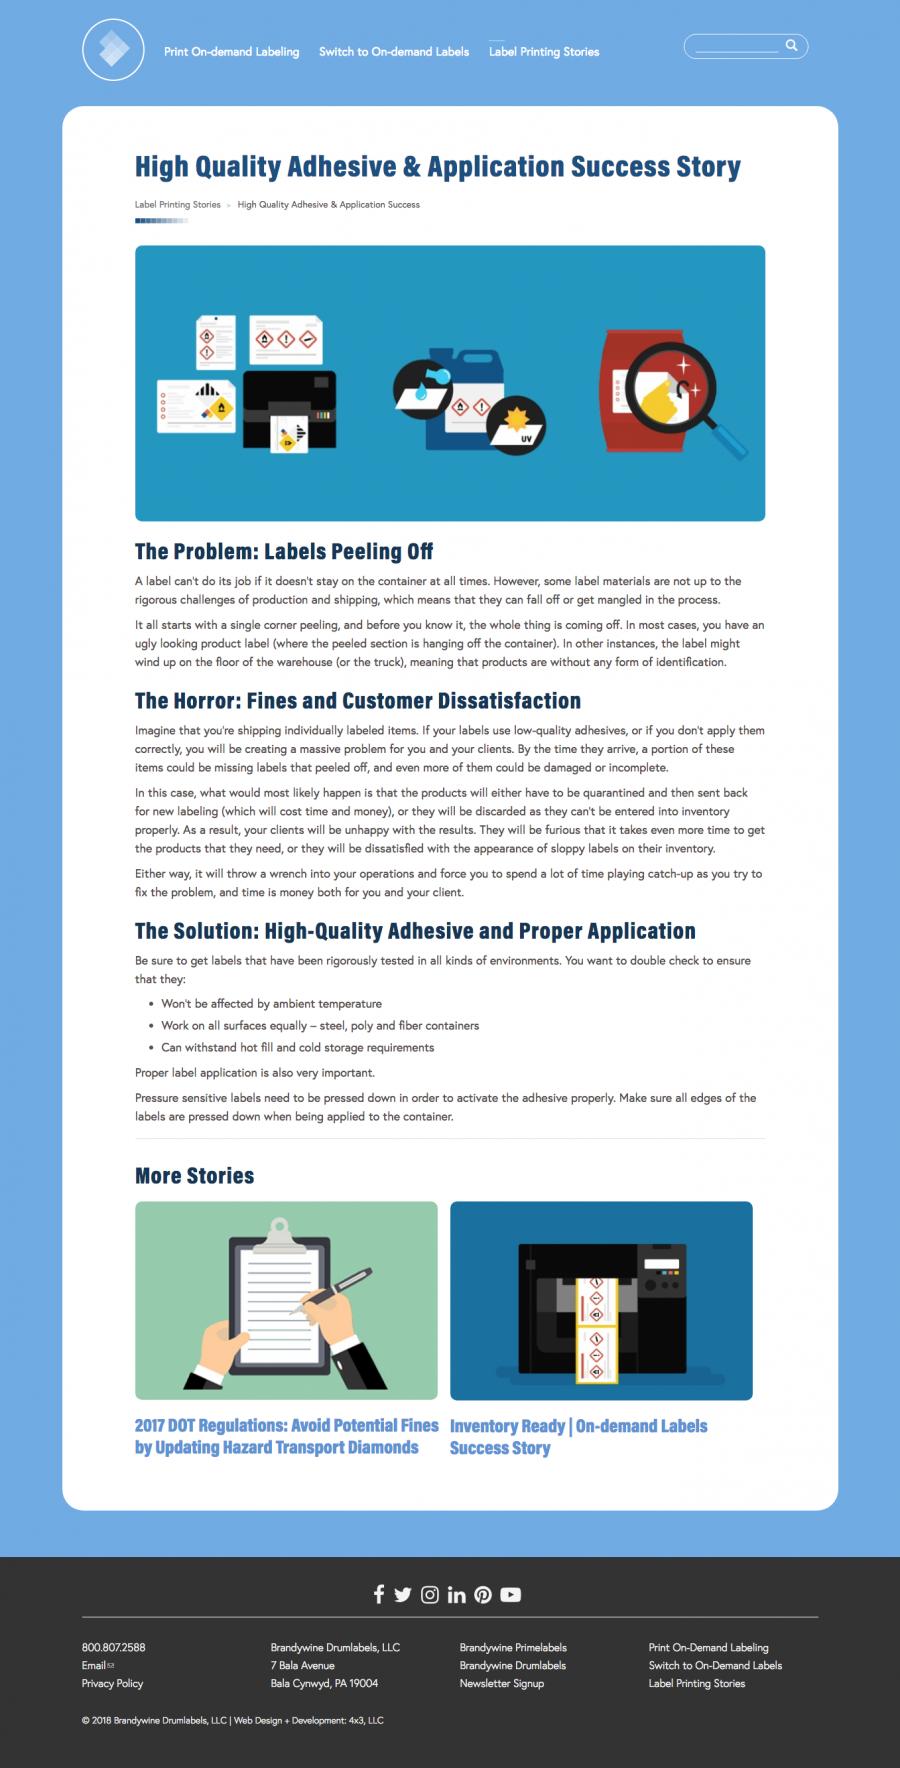 integrated SEO,blog-inspiredcontent, and organizednavigation